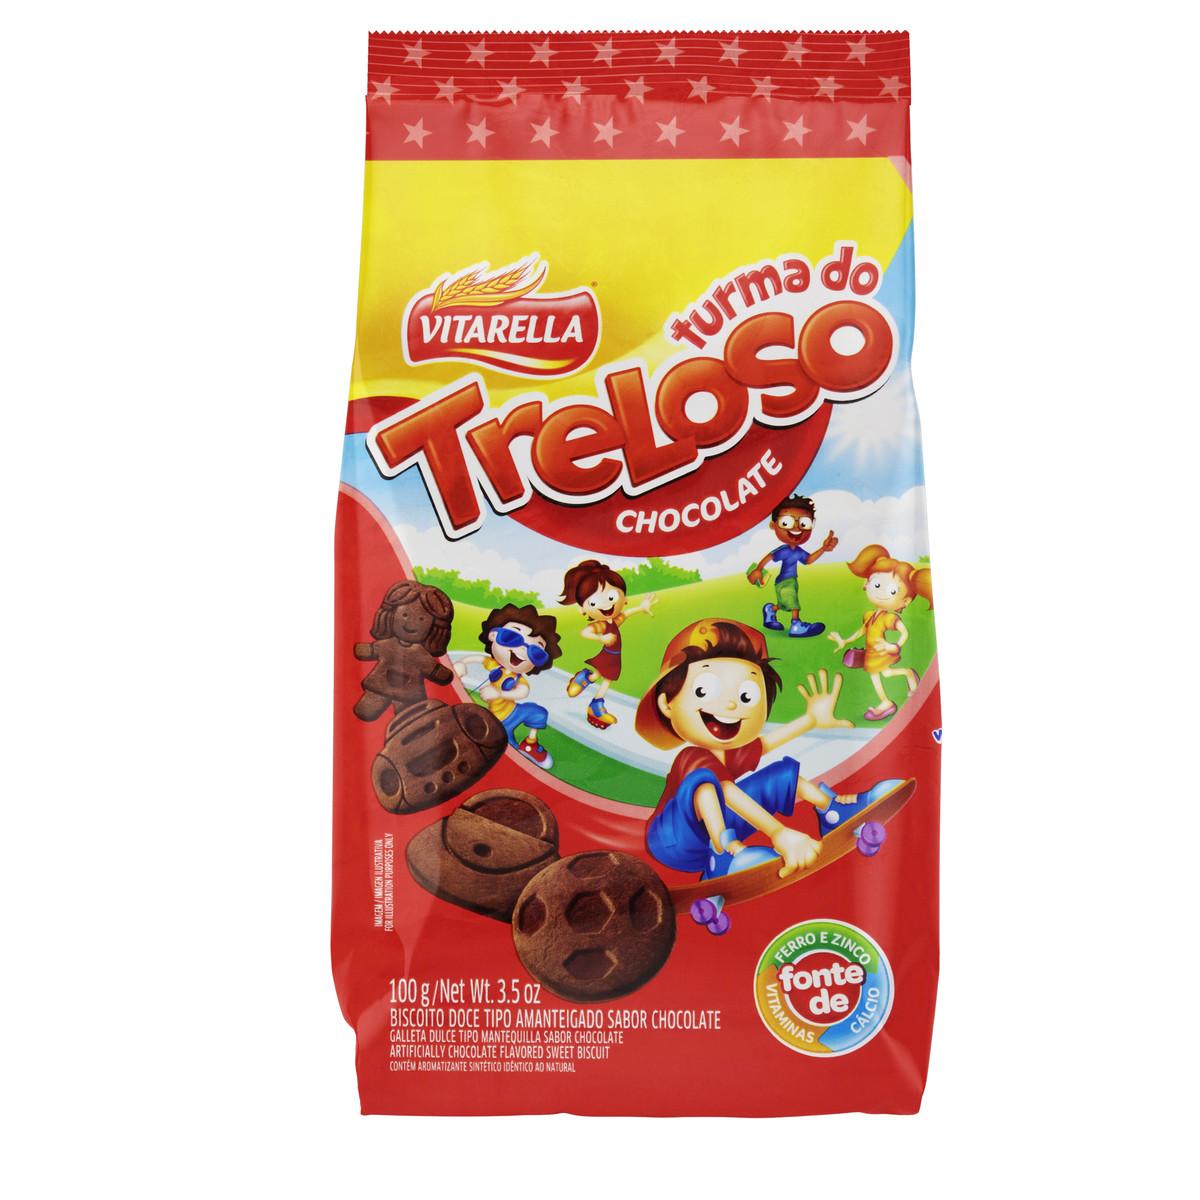 Biscoito Doce Amanteigado Chocolate 100g Vitarella/Treloso pacote PCT